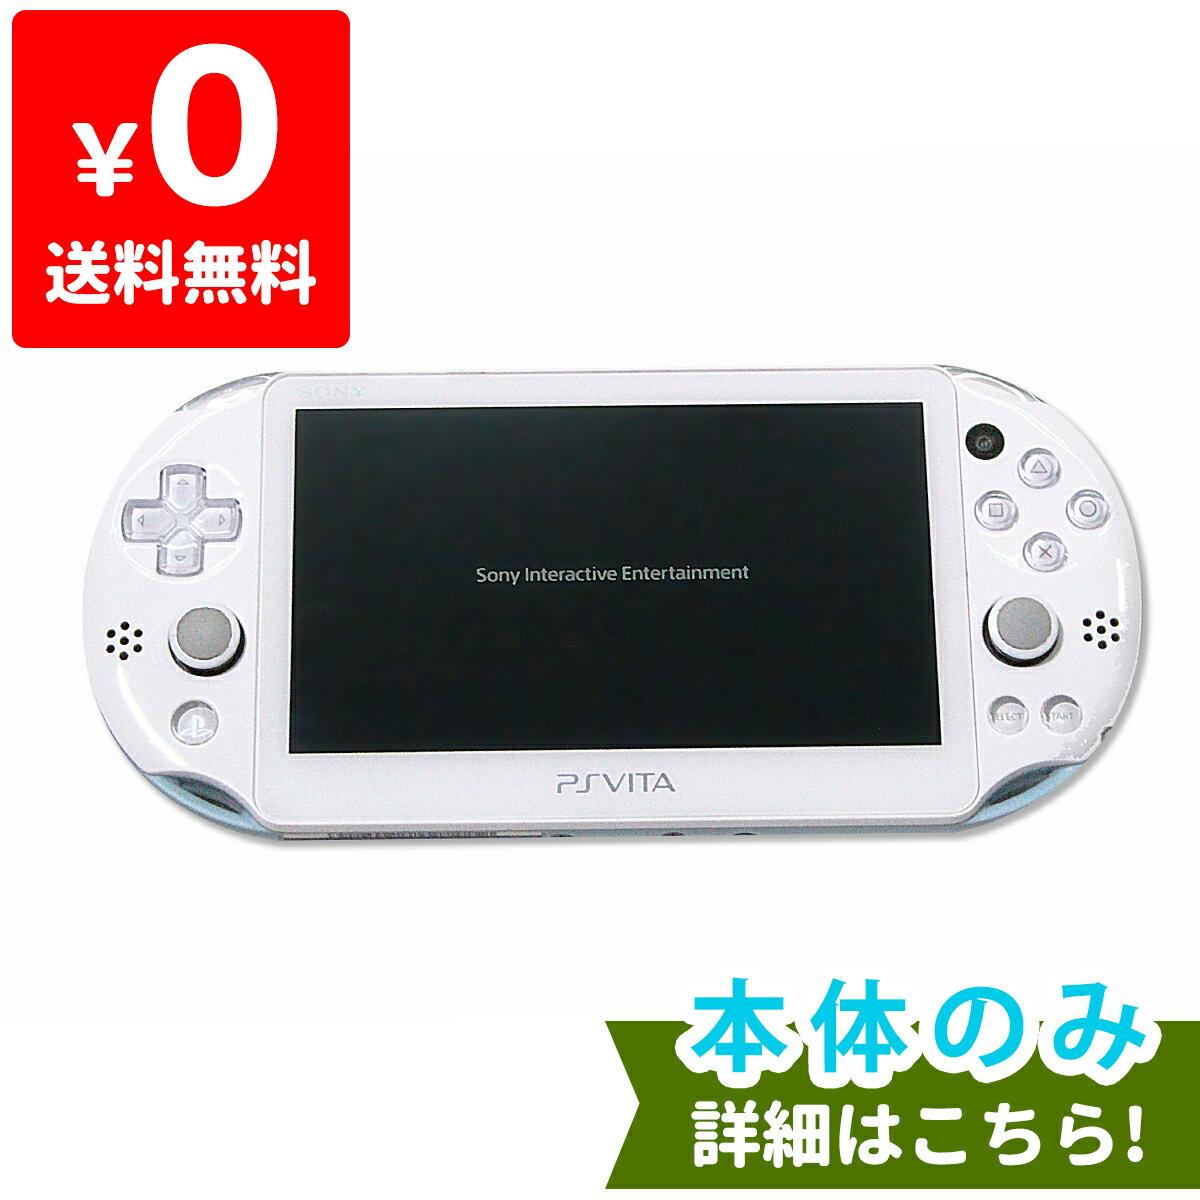 PSVita 2000 PlayStation Vita Wi-Fiモデル ライトブルー/ホワイト (PCH-2000ZA14) 本体のみ PlayStationVita SONY ソニー 中古 4948872413688 送料無料 【中古】